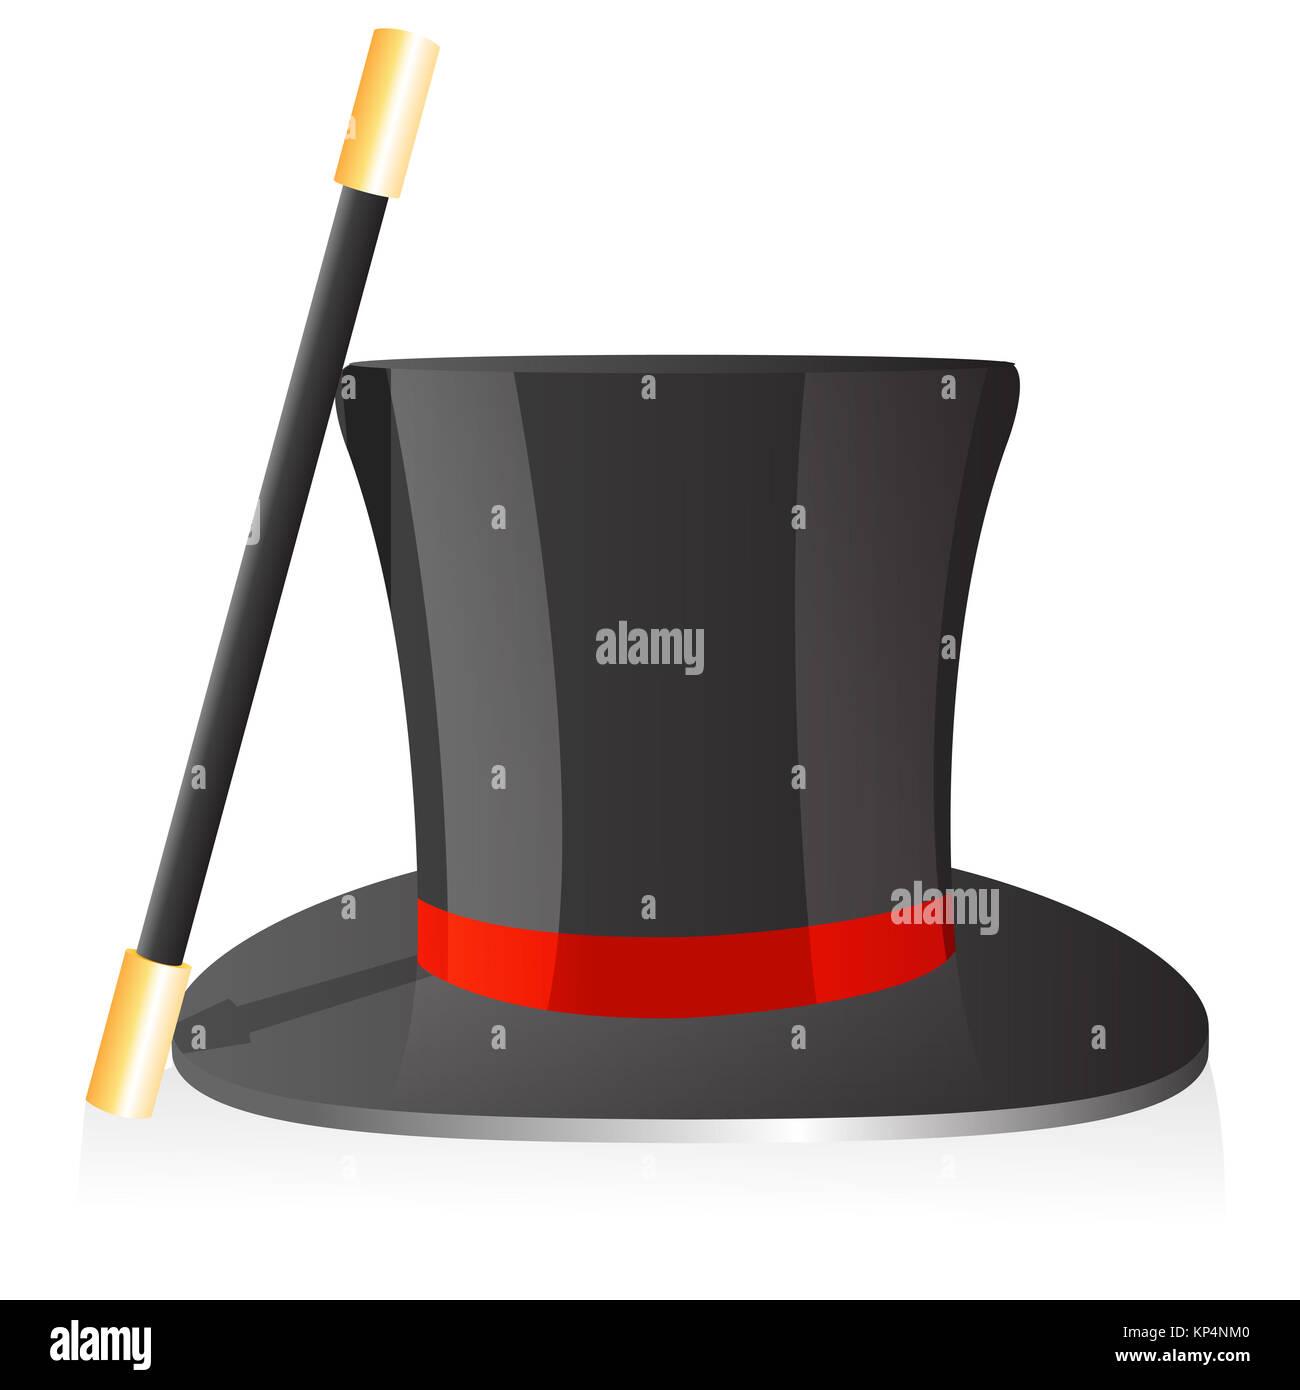 illustration of magic hat and wand on isolated background - Stock Image